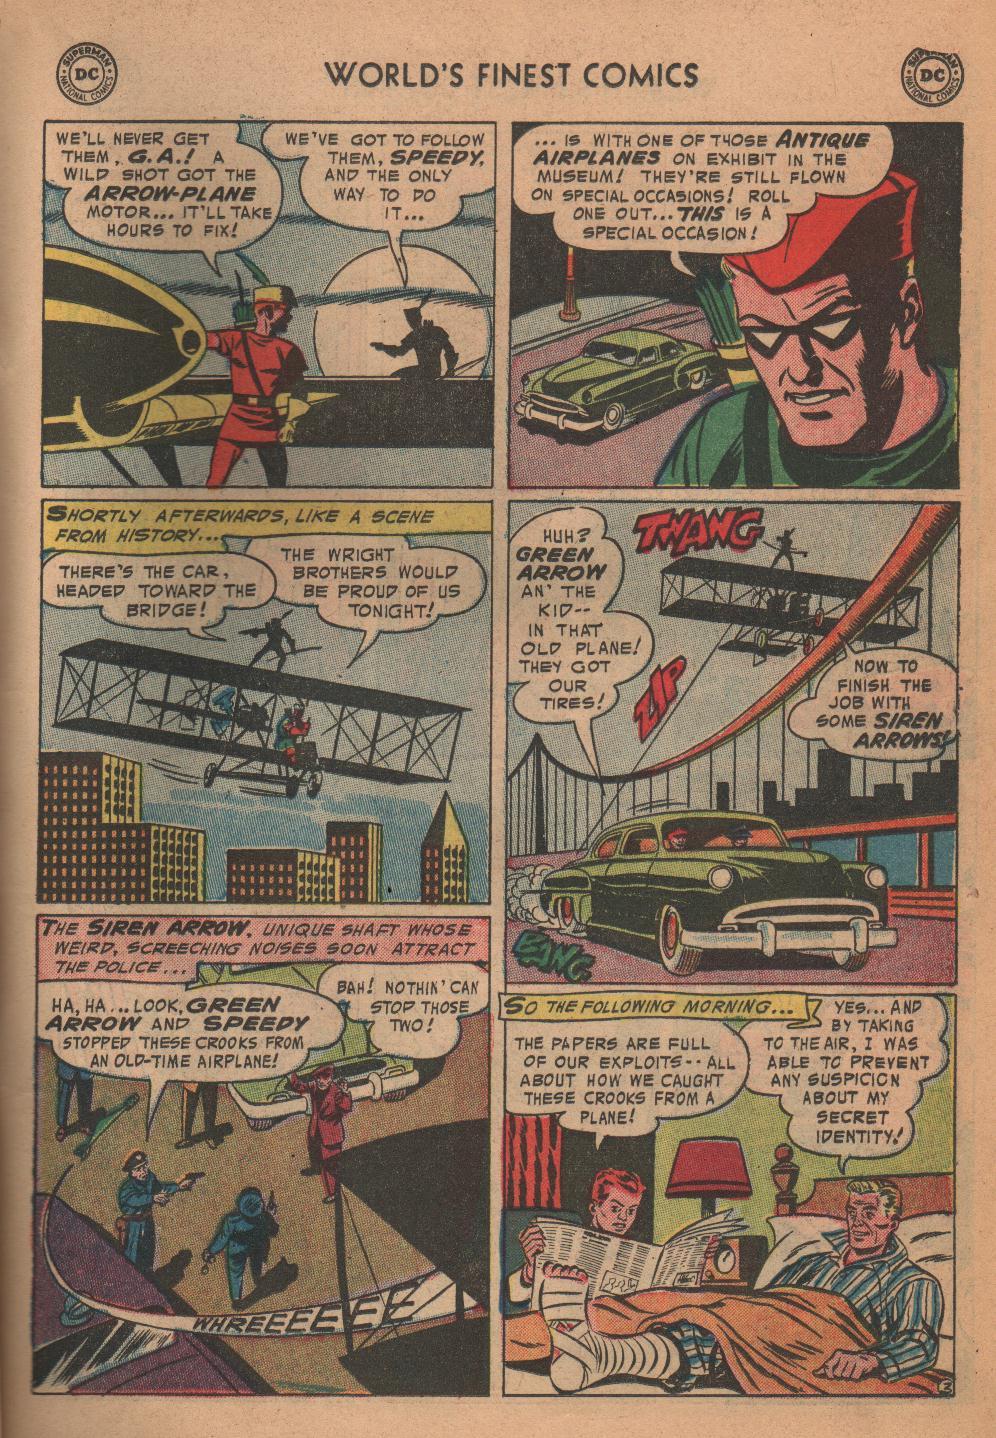 Read online World's Finest Comics comic -  Issue #72 - 19